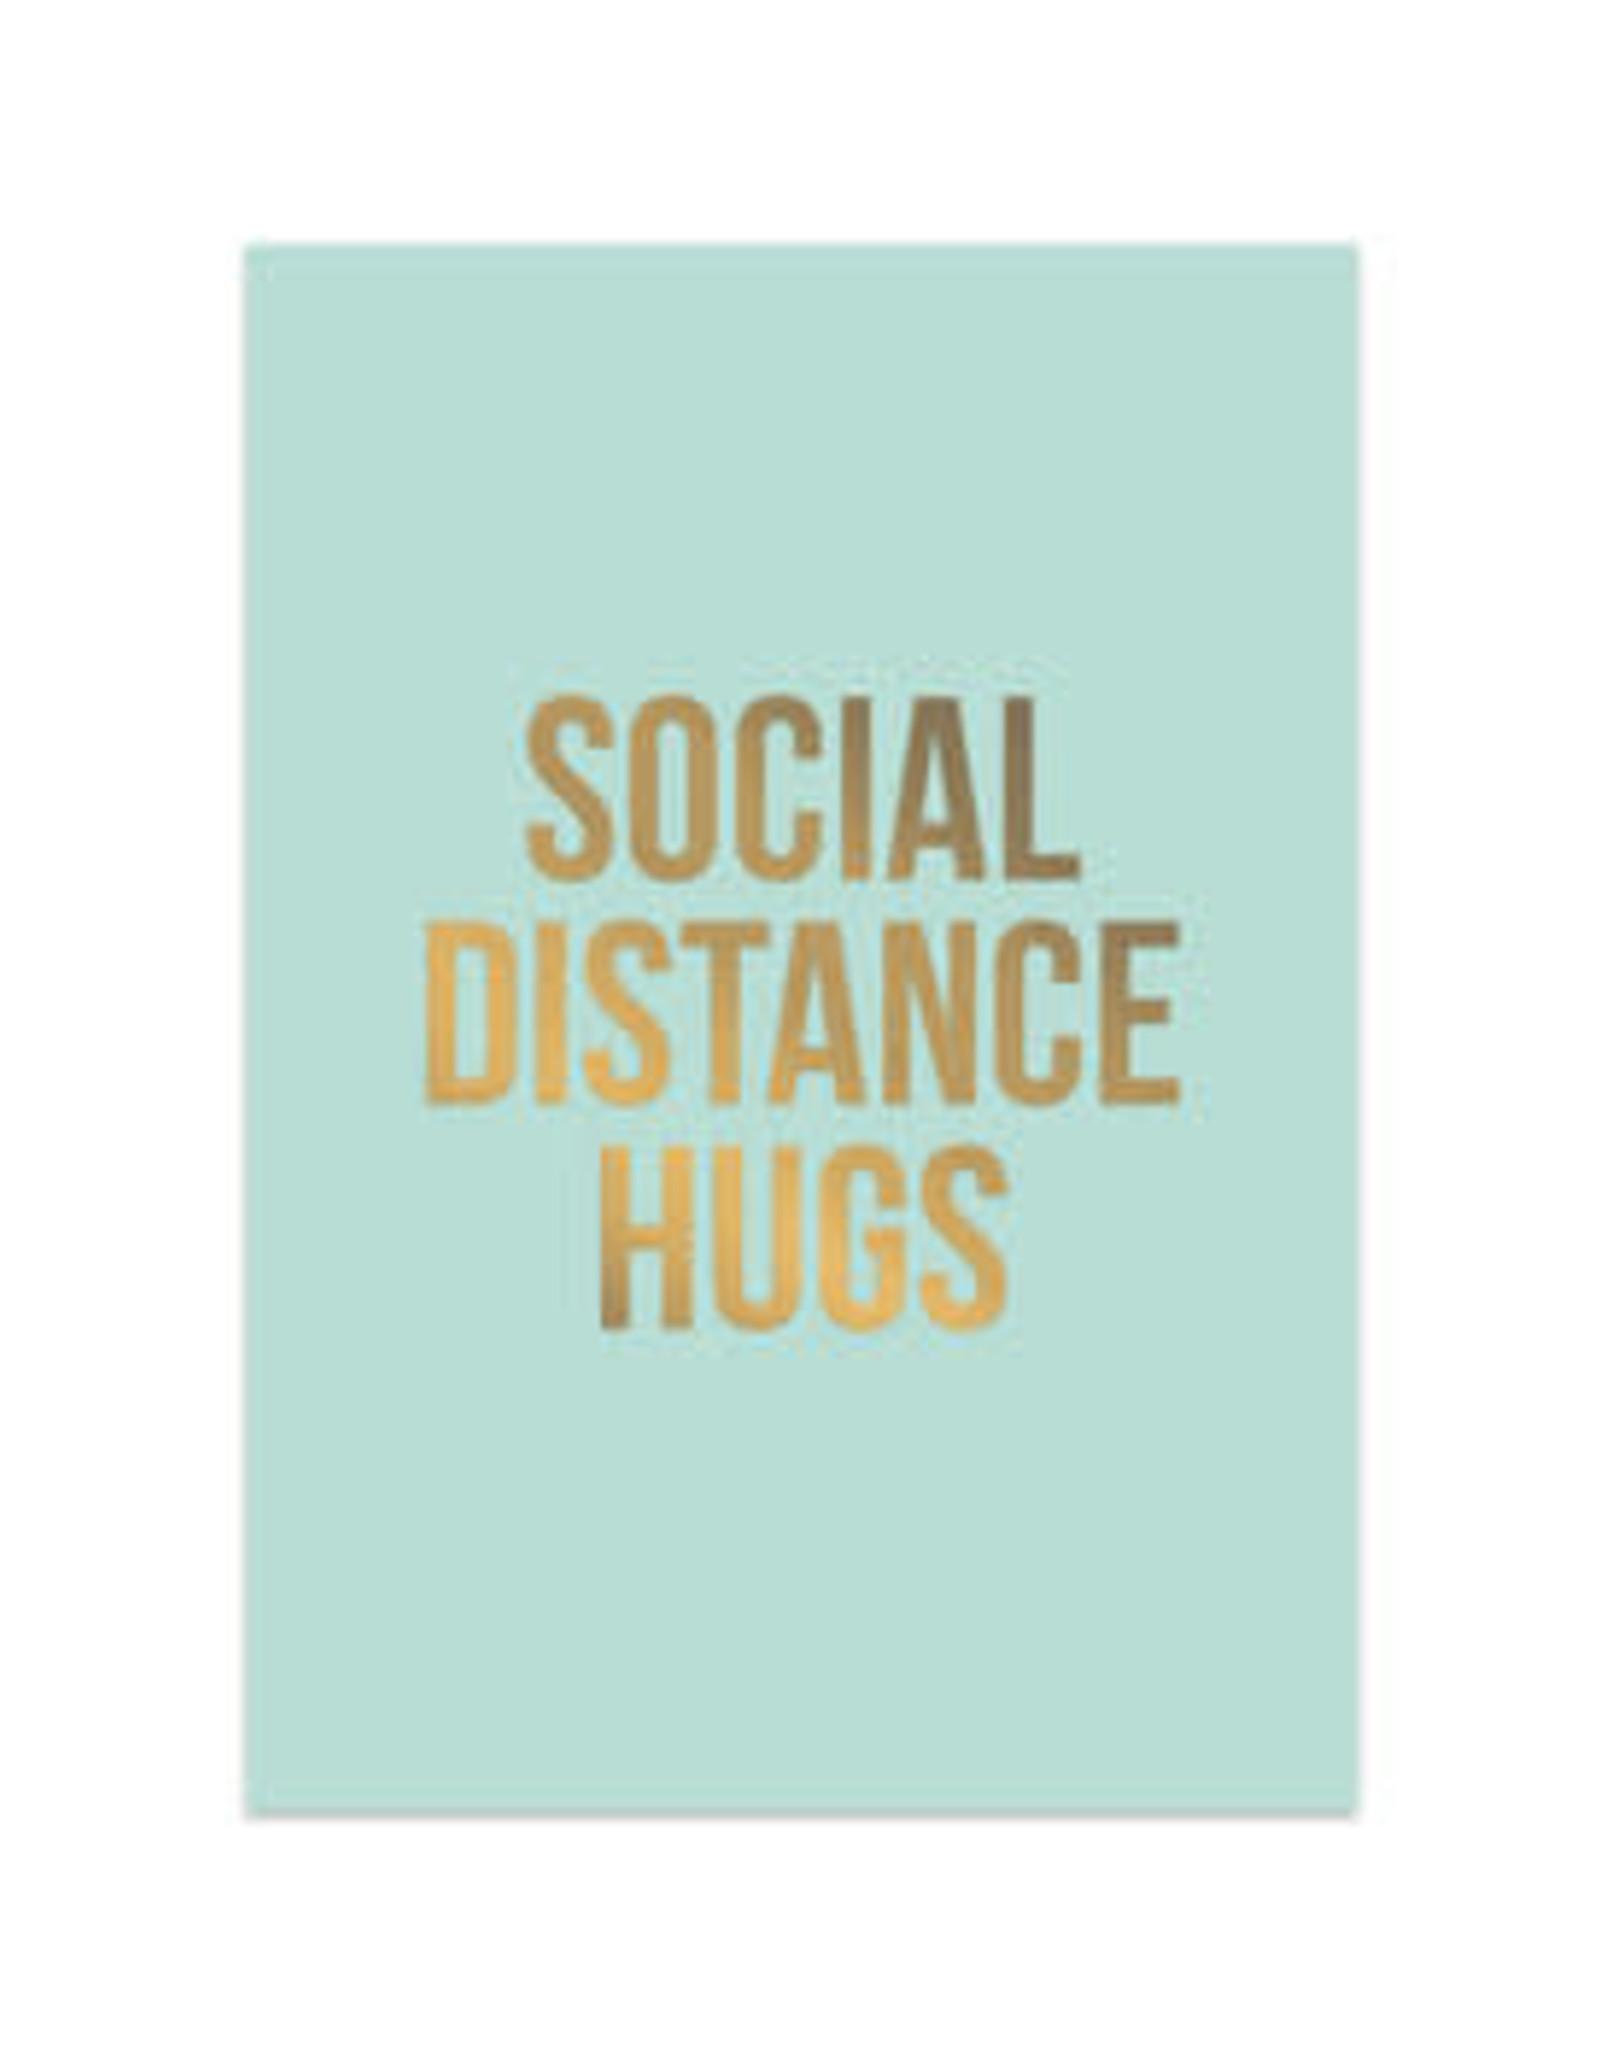 studio stationery Studio stationery kaart A6 Social distance hugs